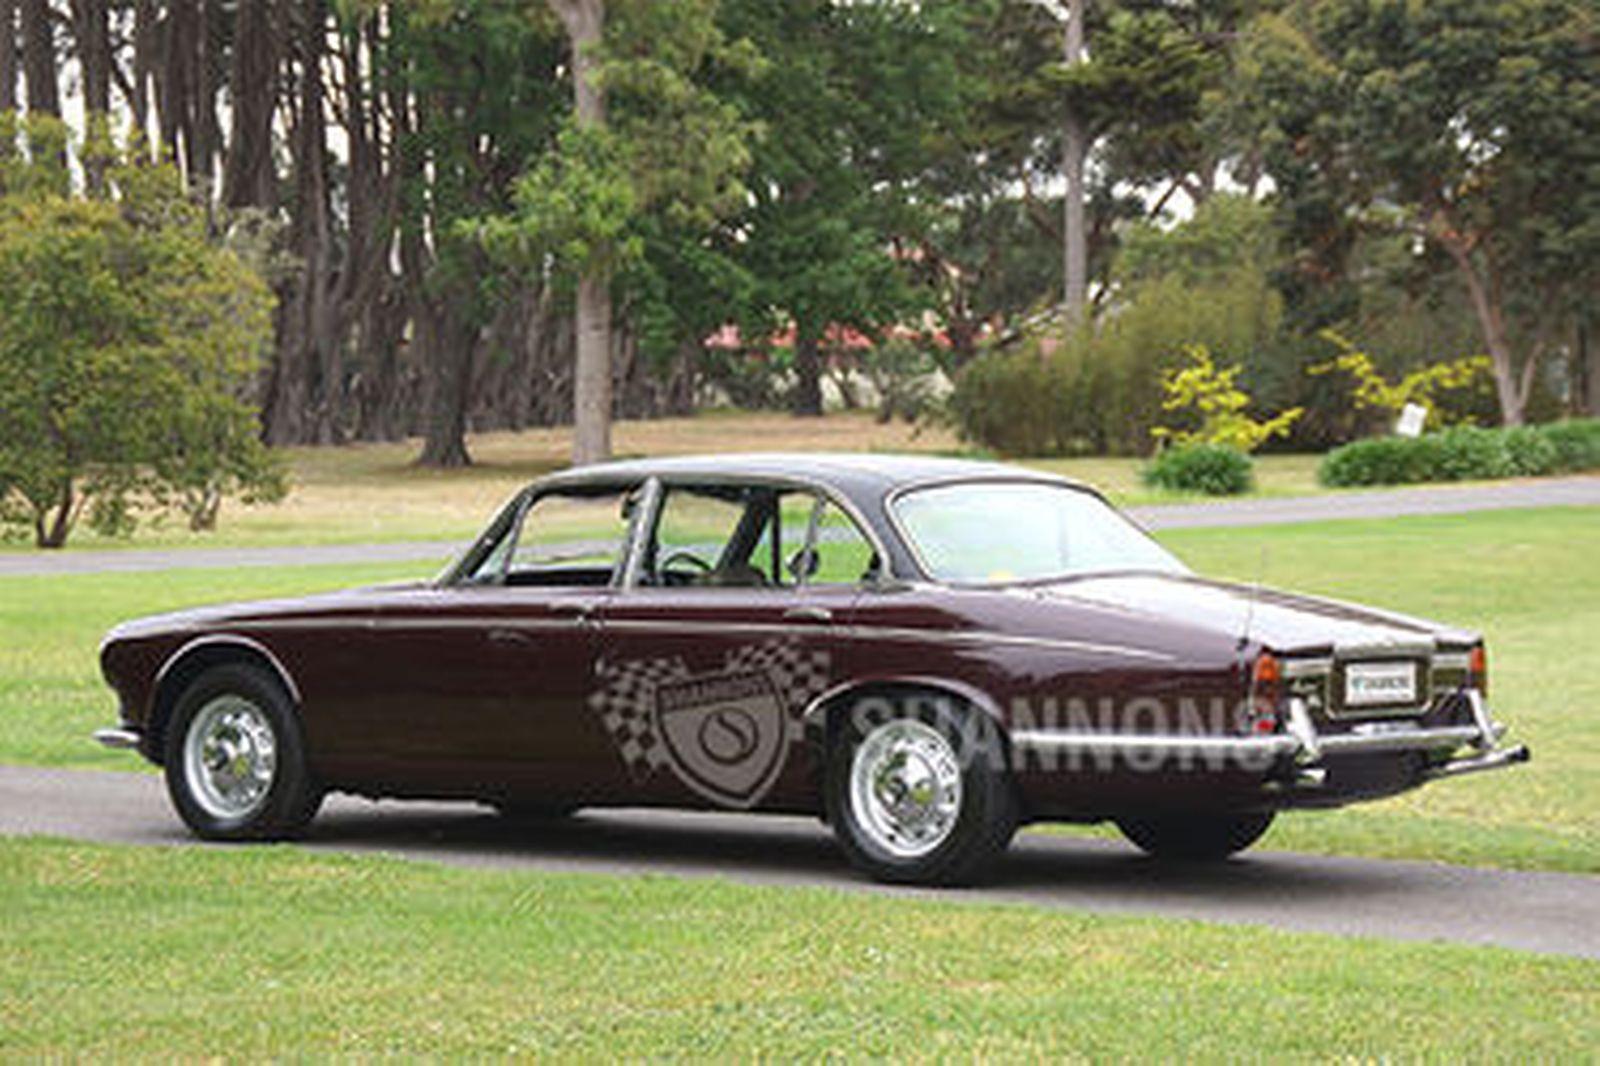 Daimler Double Six Vanden Plas Saloon